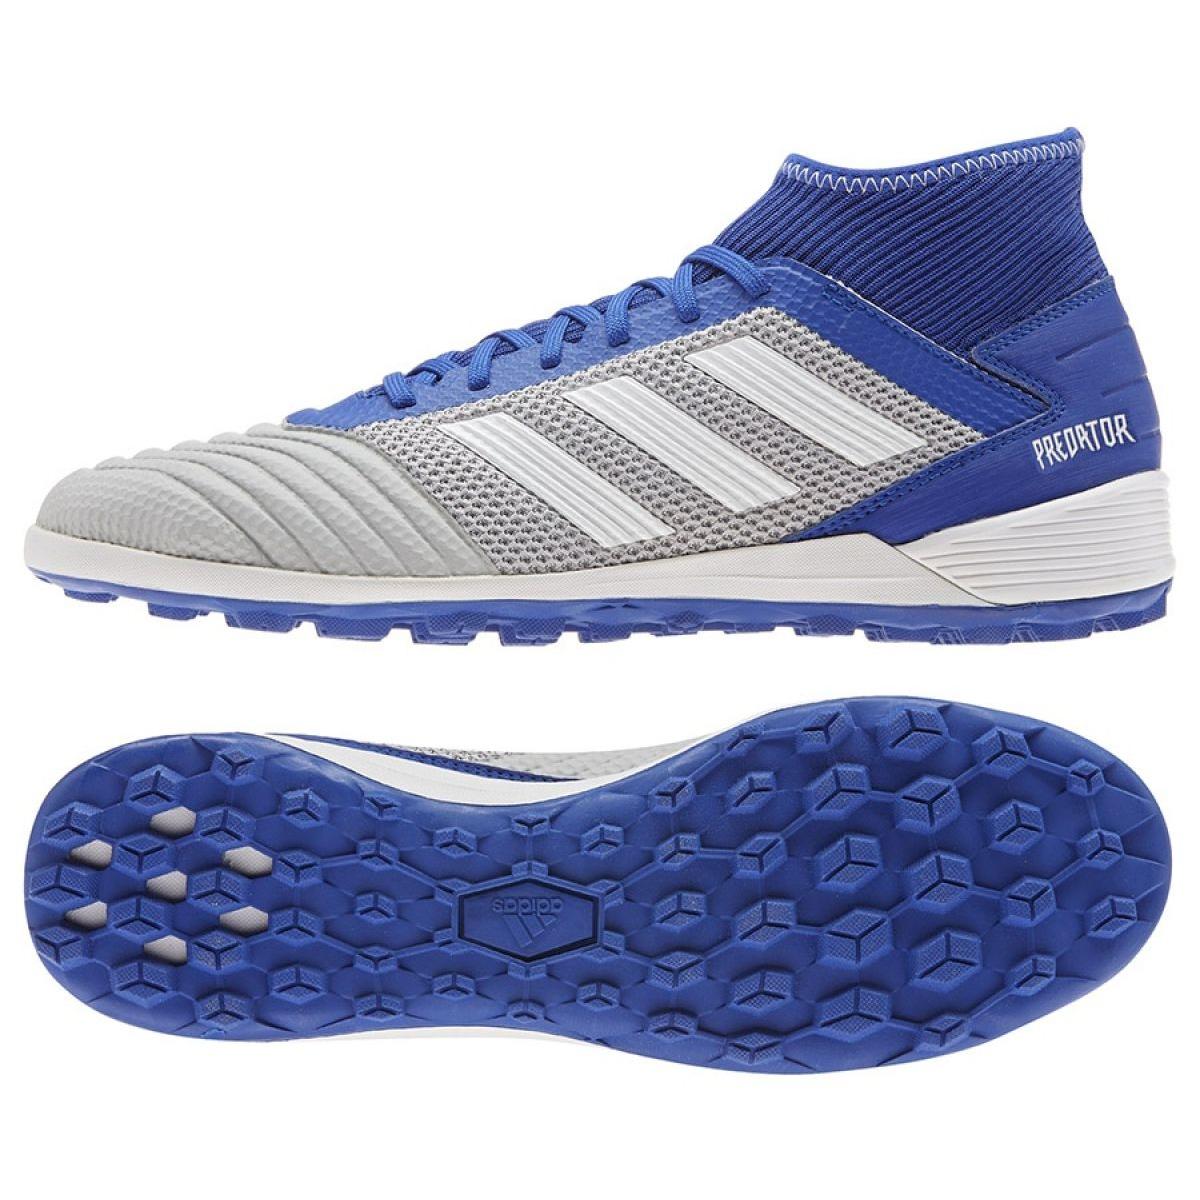 Chuteiras de futebol adidas Predator 19.3 Tf M BC0555 azul, cinza prata azul